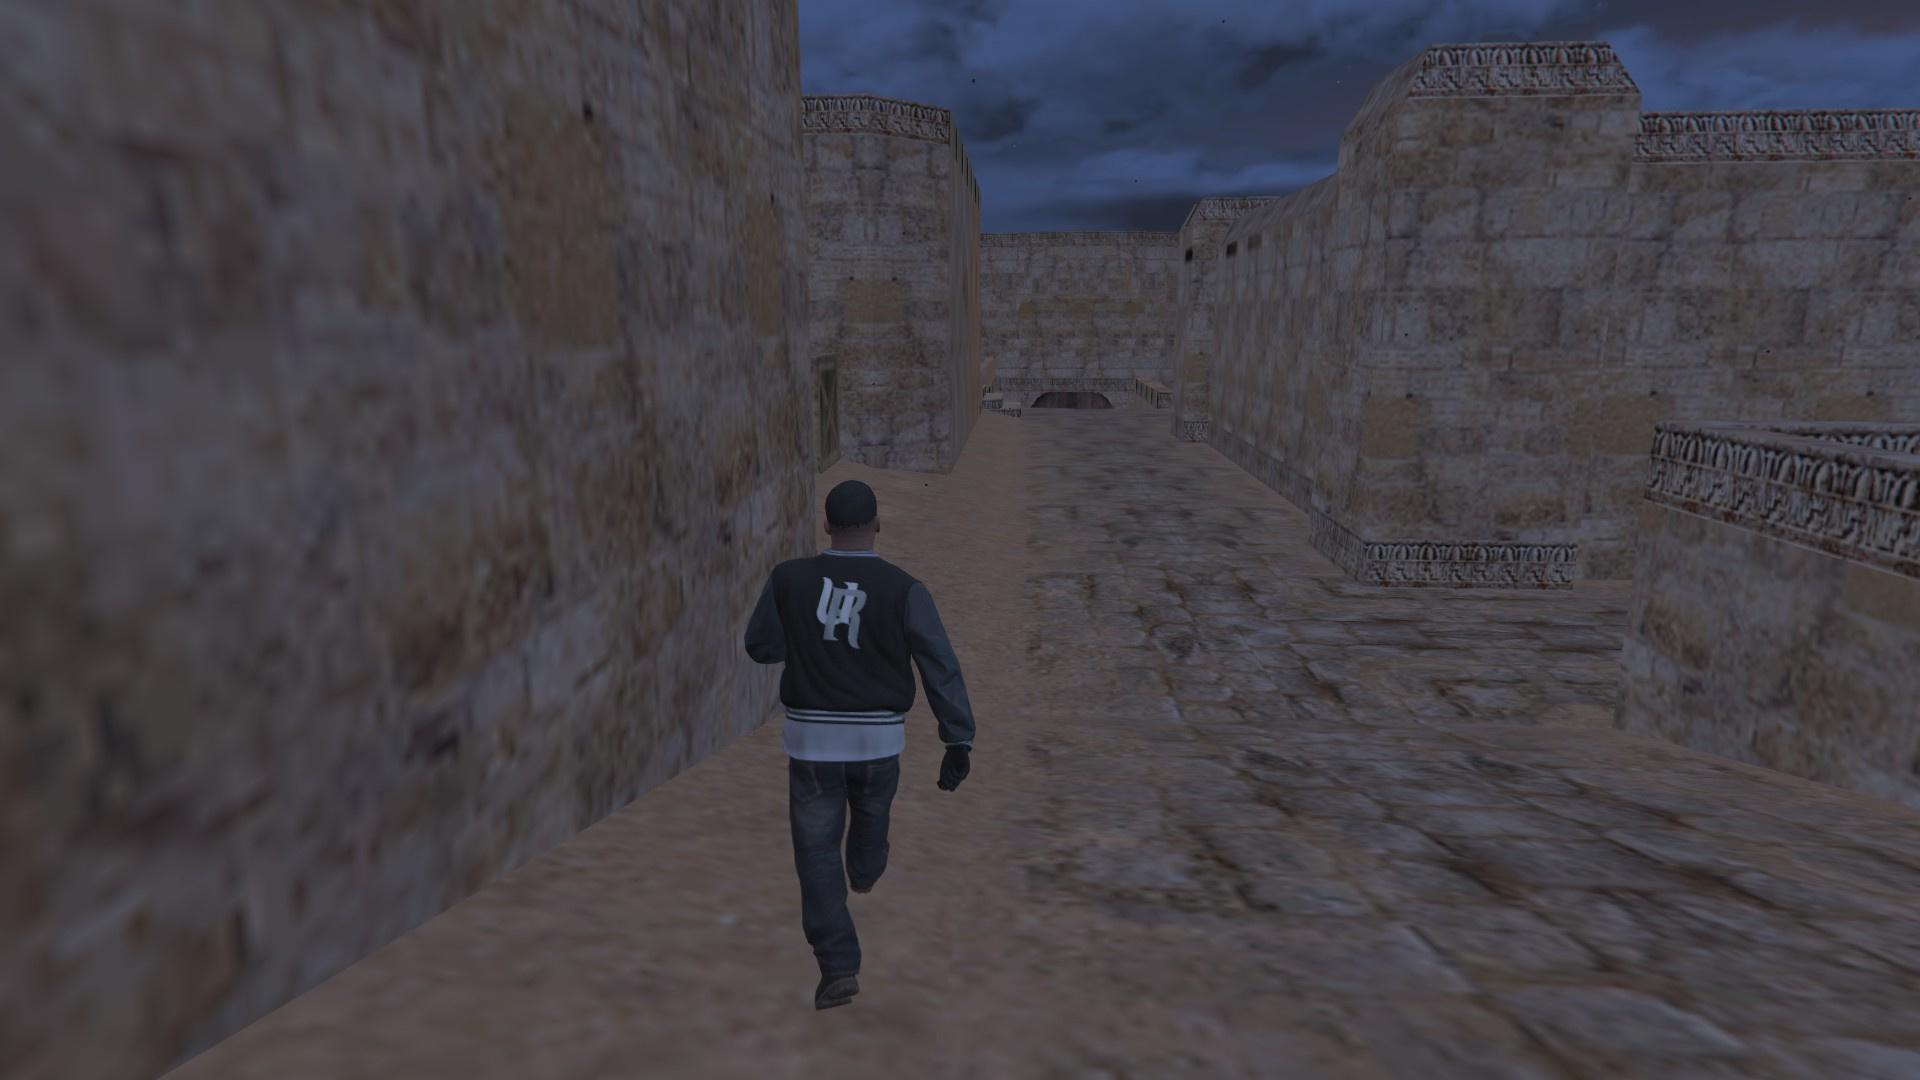 De_Dust 2 From Counter Strike 1.6 - GTA5-Mods.com